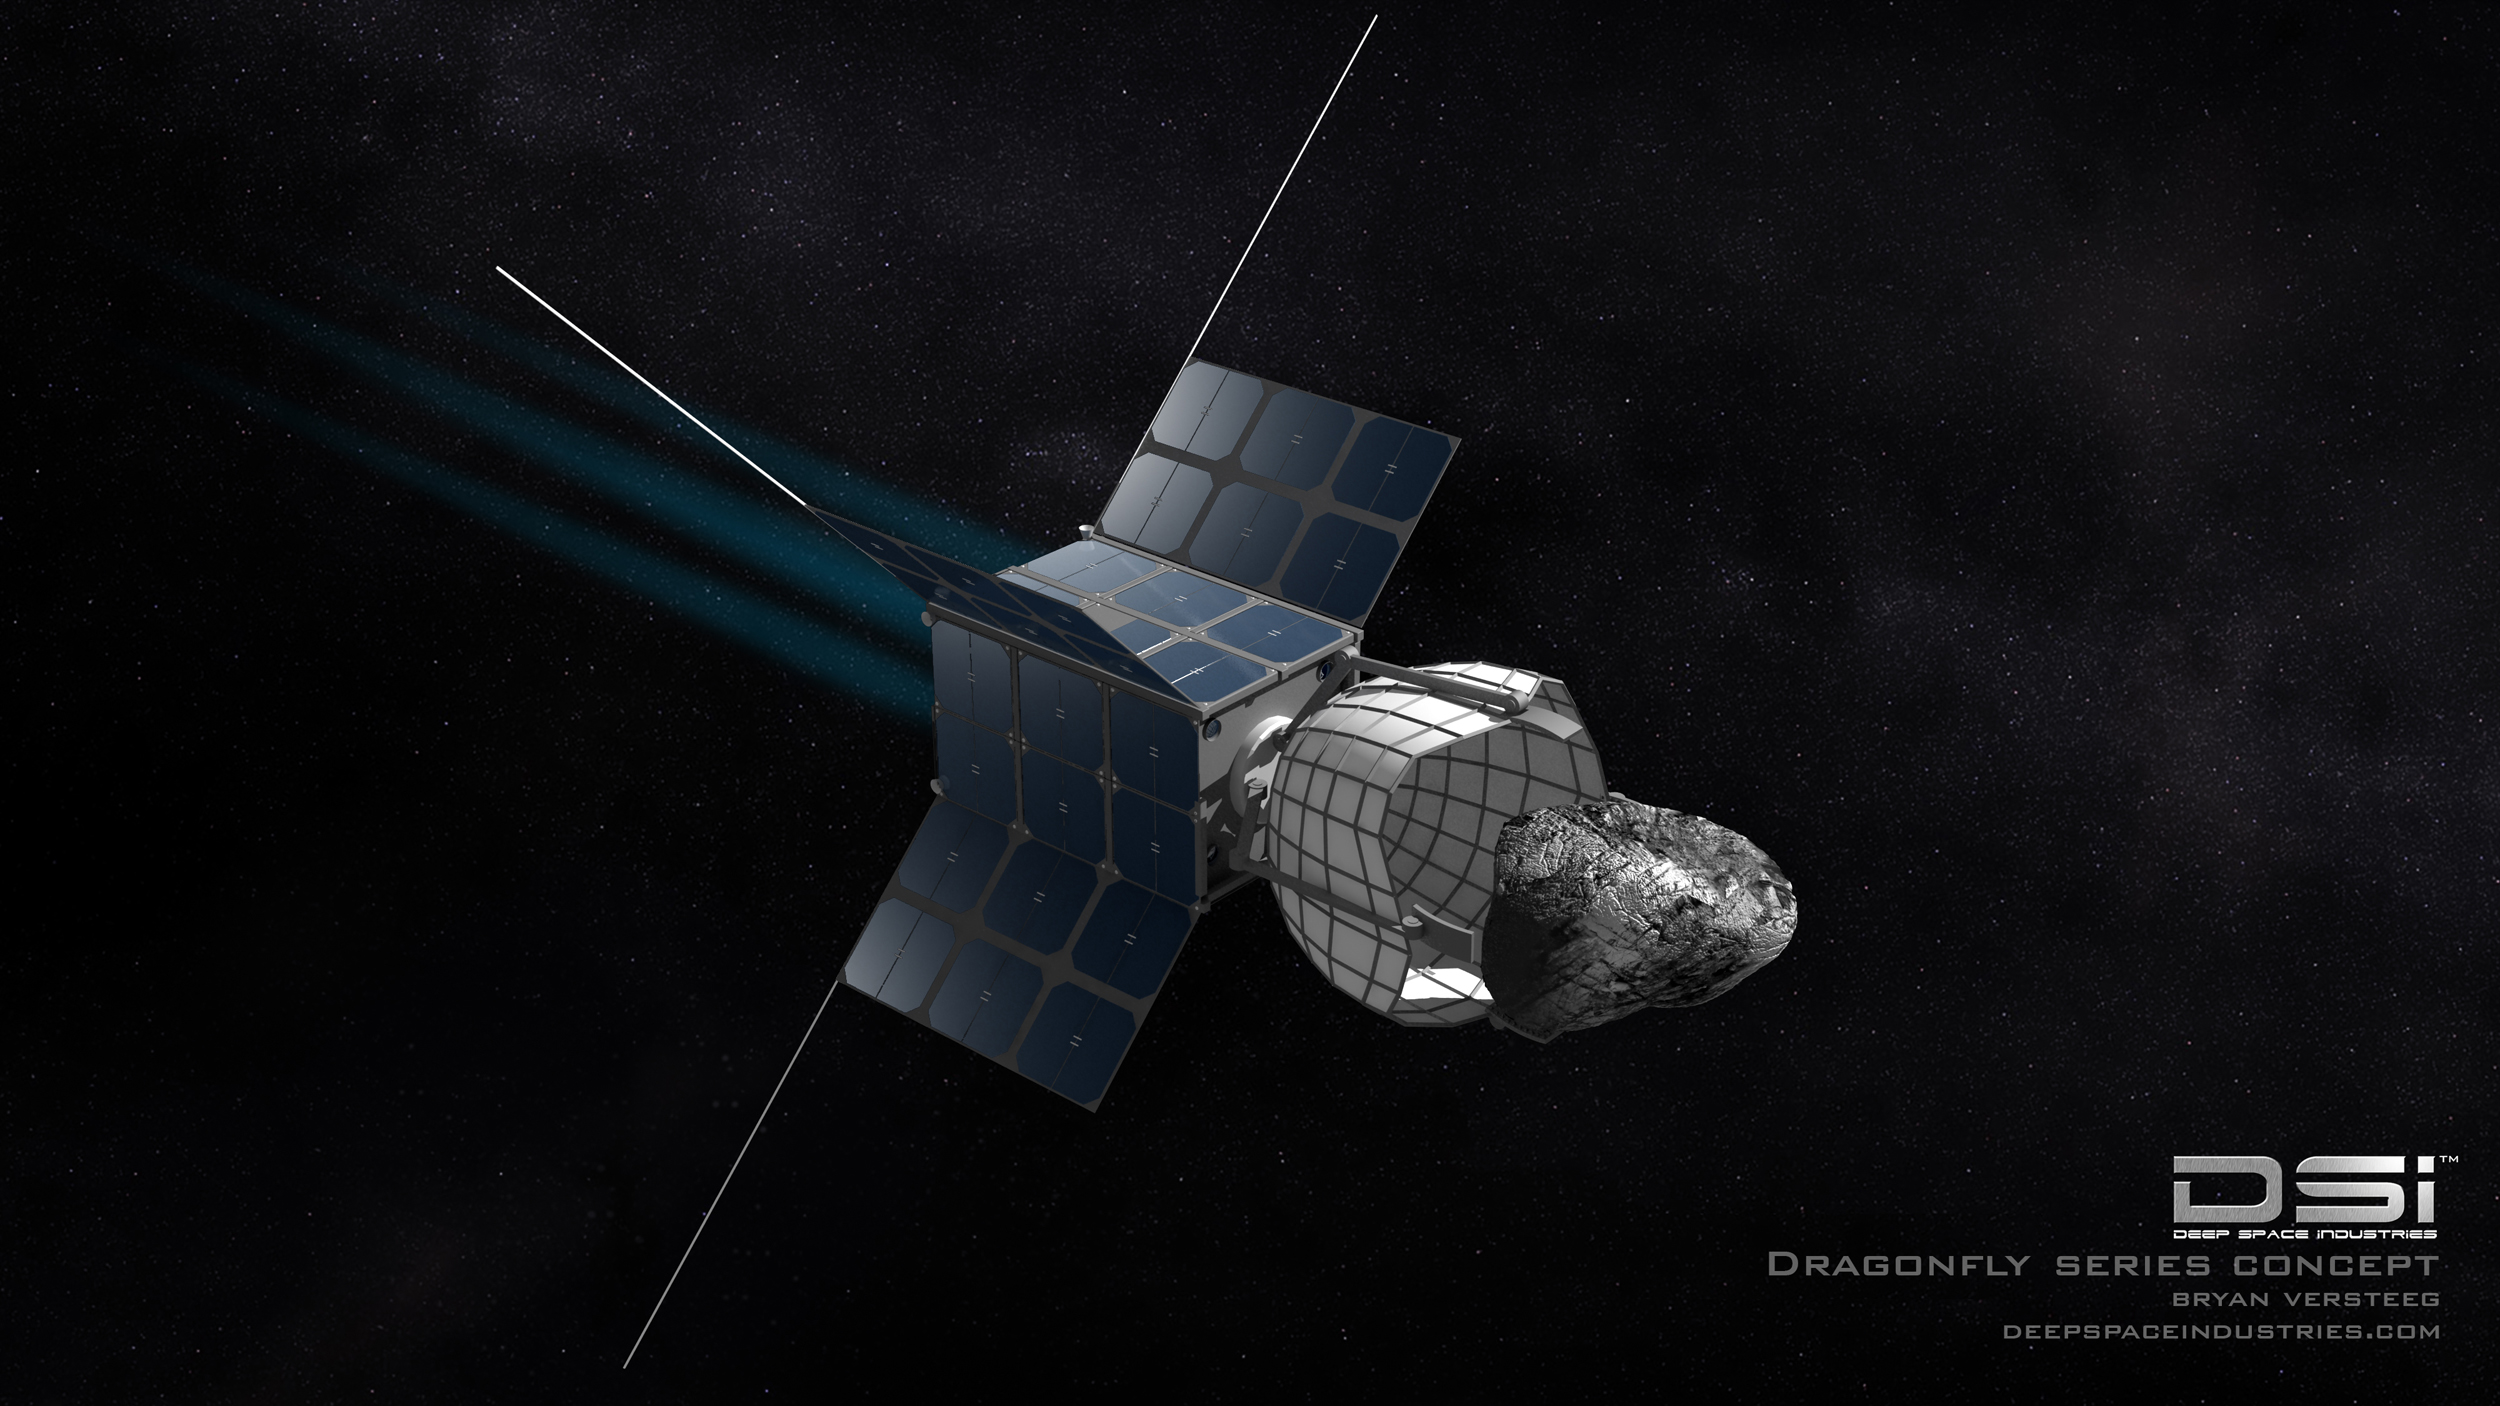 Deep Space Industries Dragonfly Spacecraft